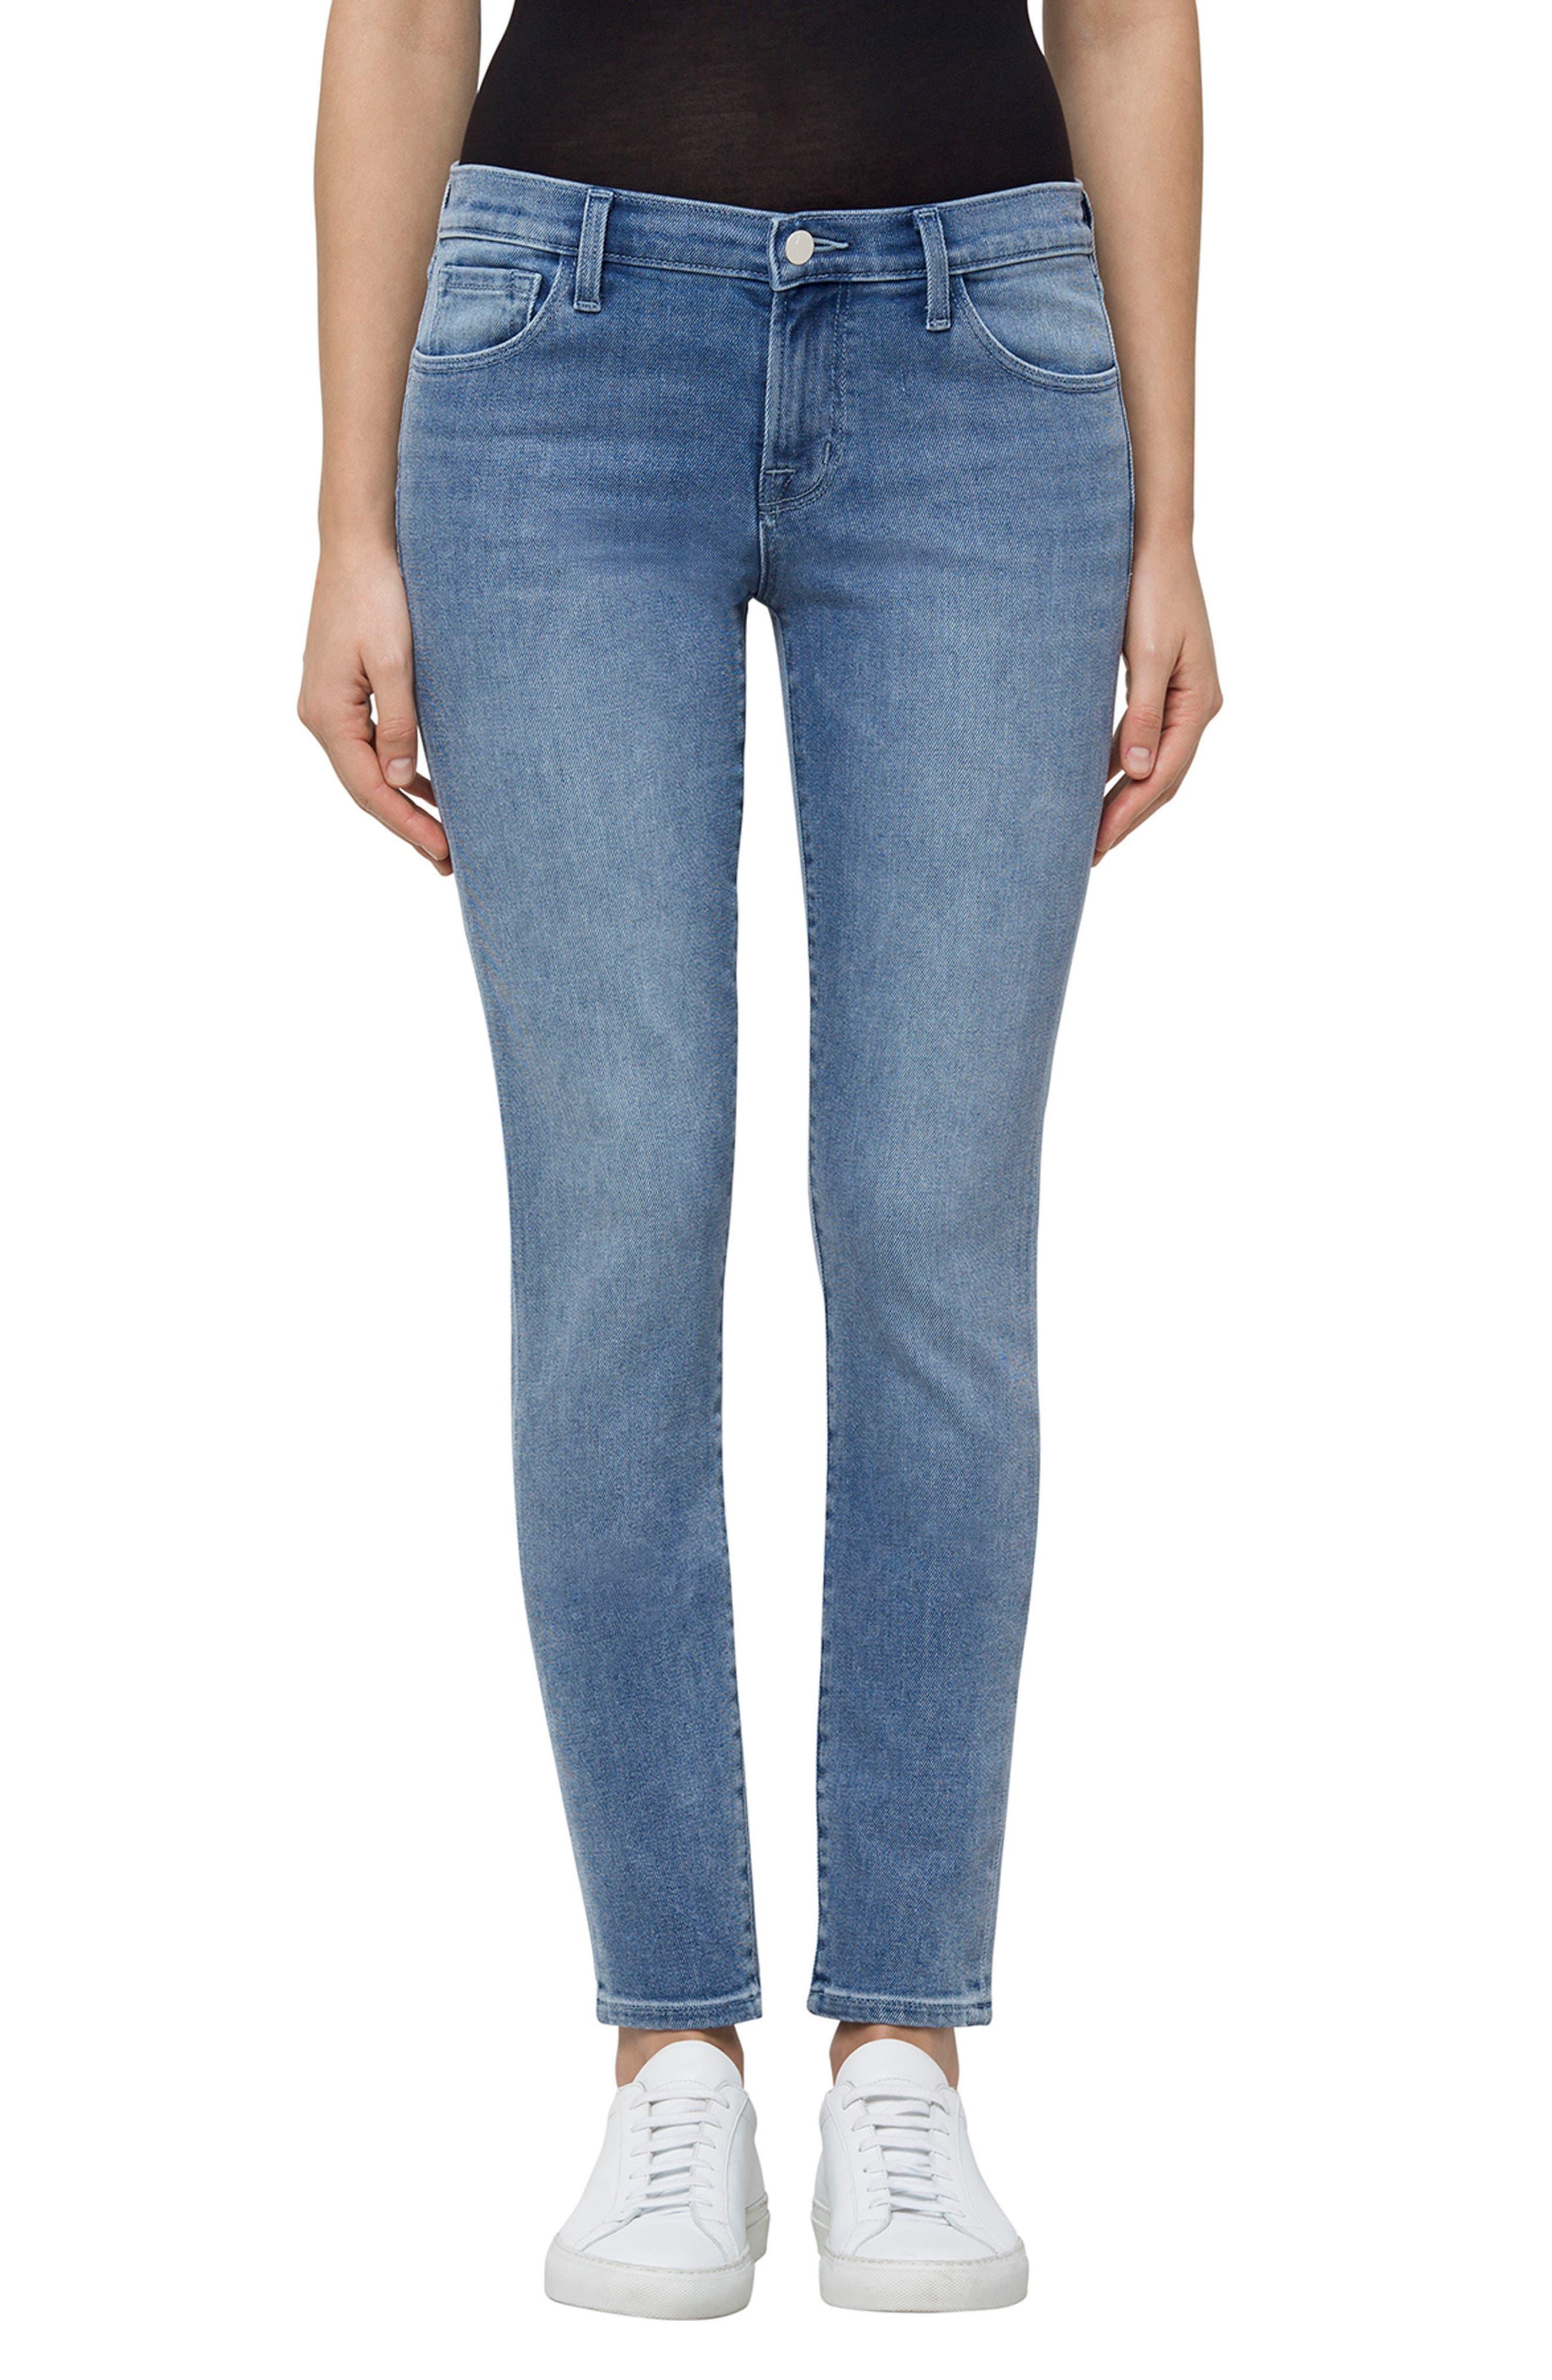 811 Skinny Jeans,                             Main thumbnail 1, color,                             455